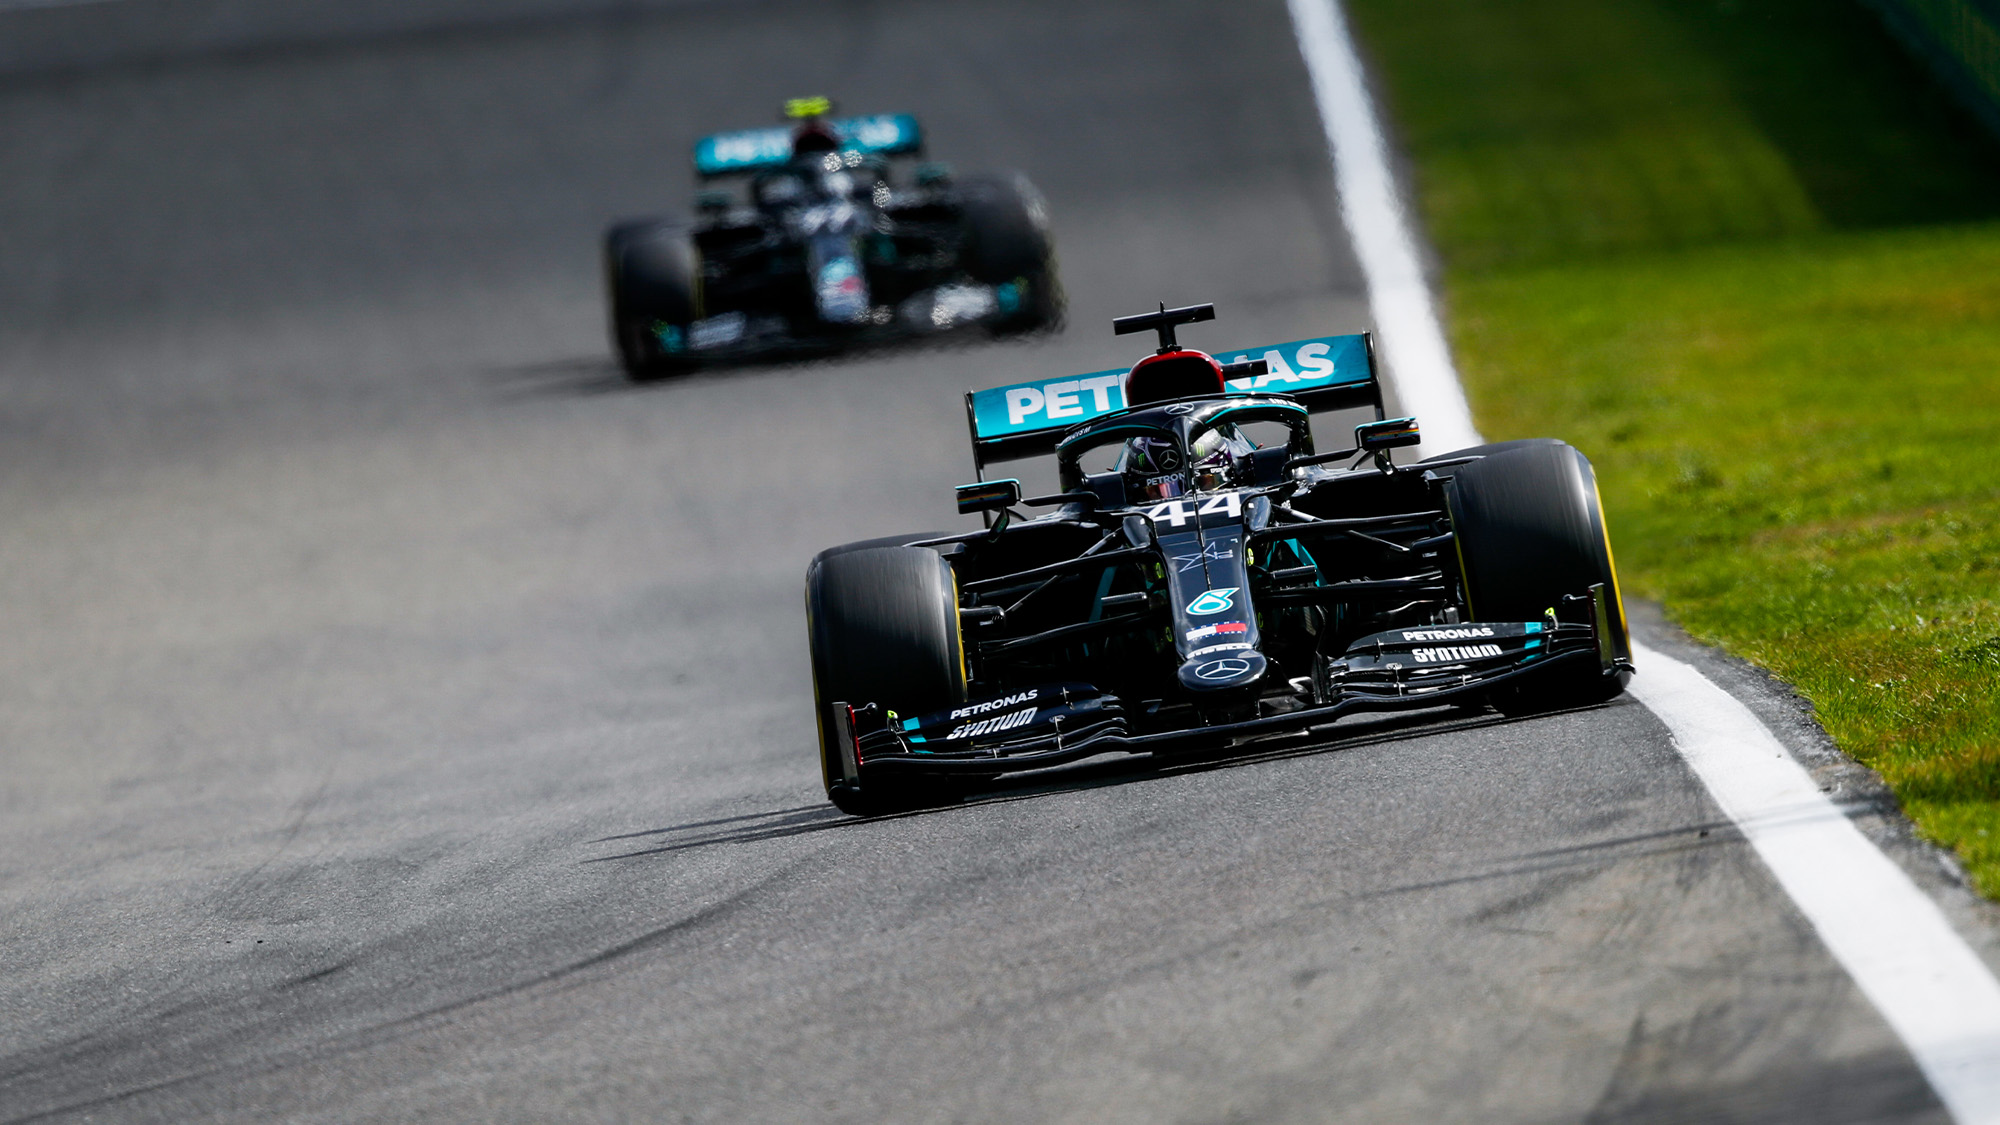 Lewis Hamilton ahead of Valtteri Bottas at Spa Francorchamps during the 2020 F1 Belgian Grand prix